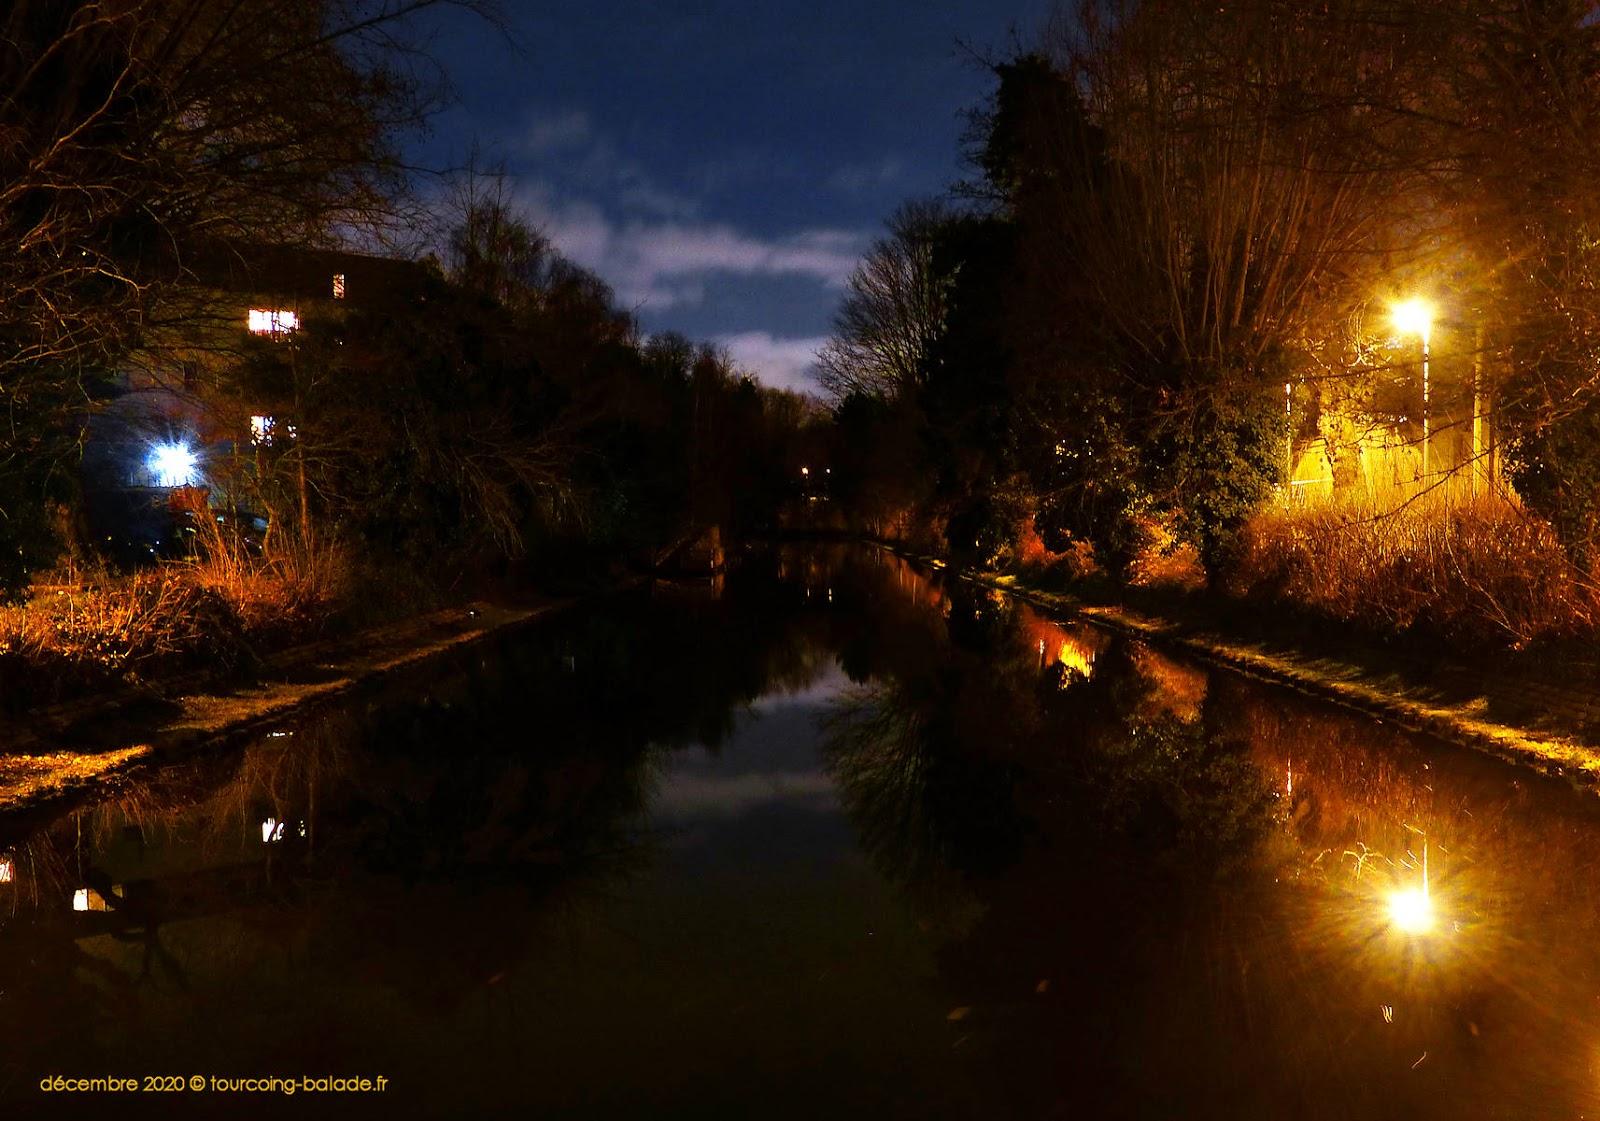 Canal de Tourcoing, Nuit Hiver 2020